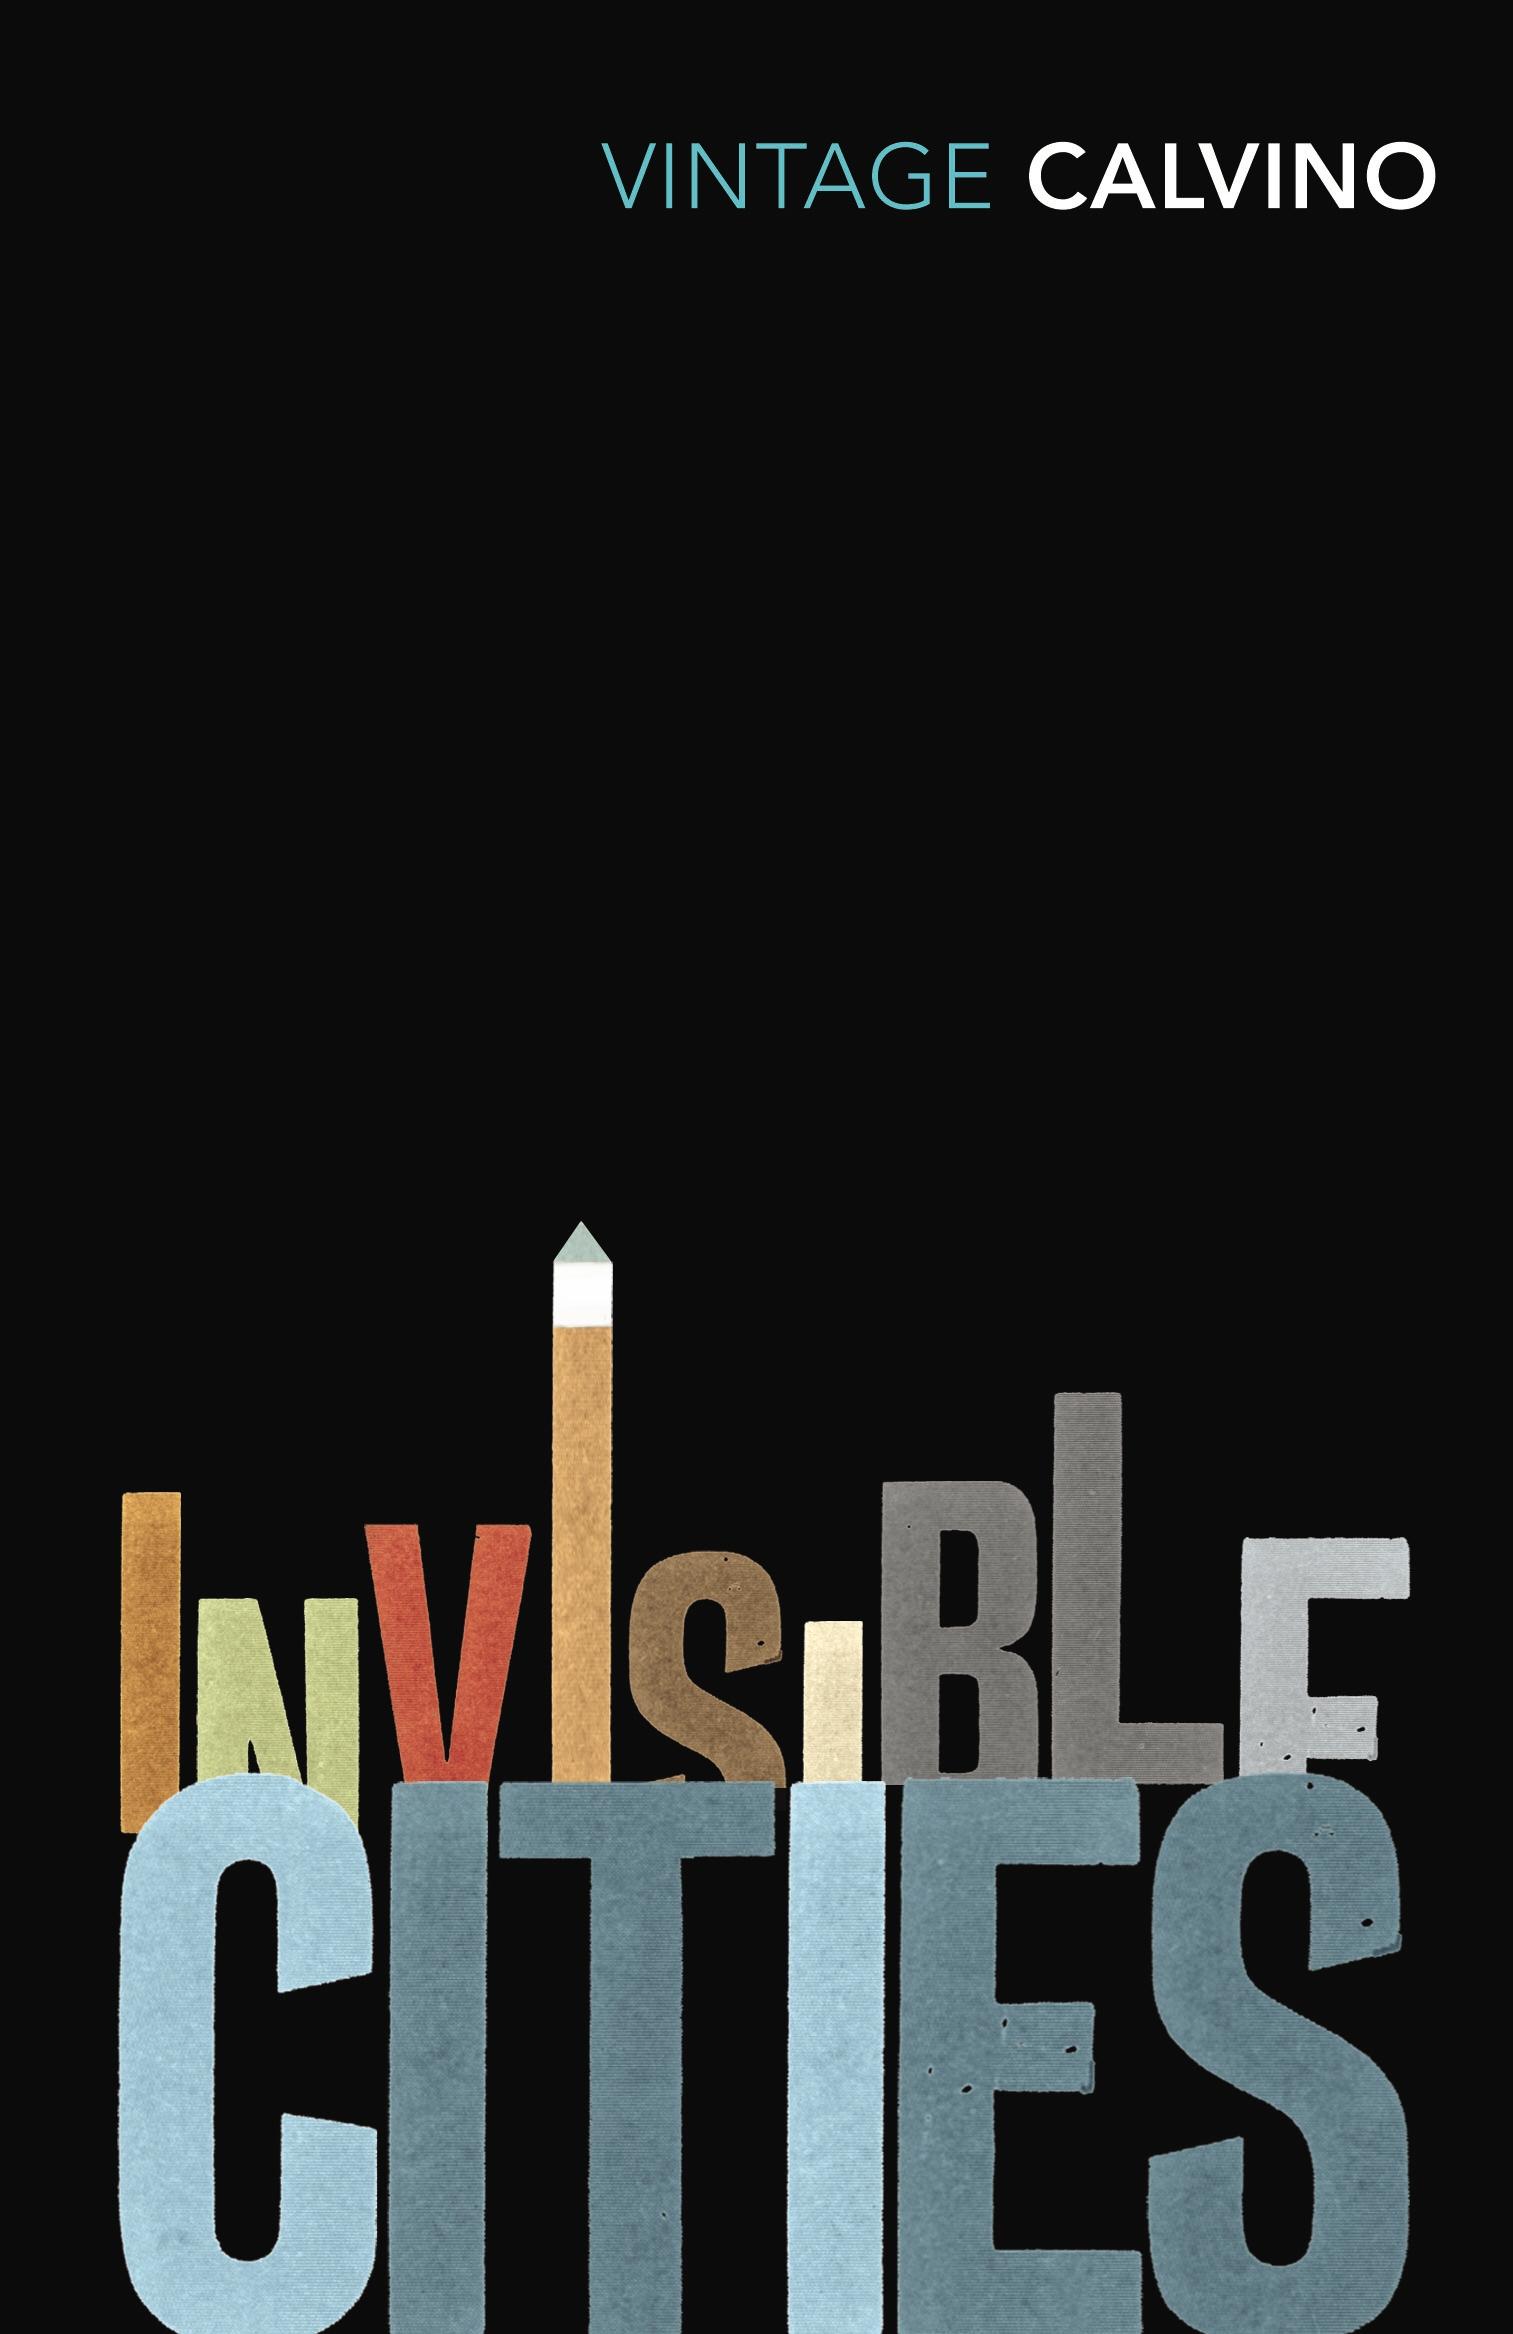 italo calvino s invisible cities Portrayed in calvino's invisible cities the disappearing act: venice and italo calvino's 'invisible italo calvino's invisible cities was published.